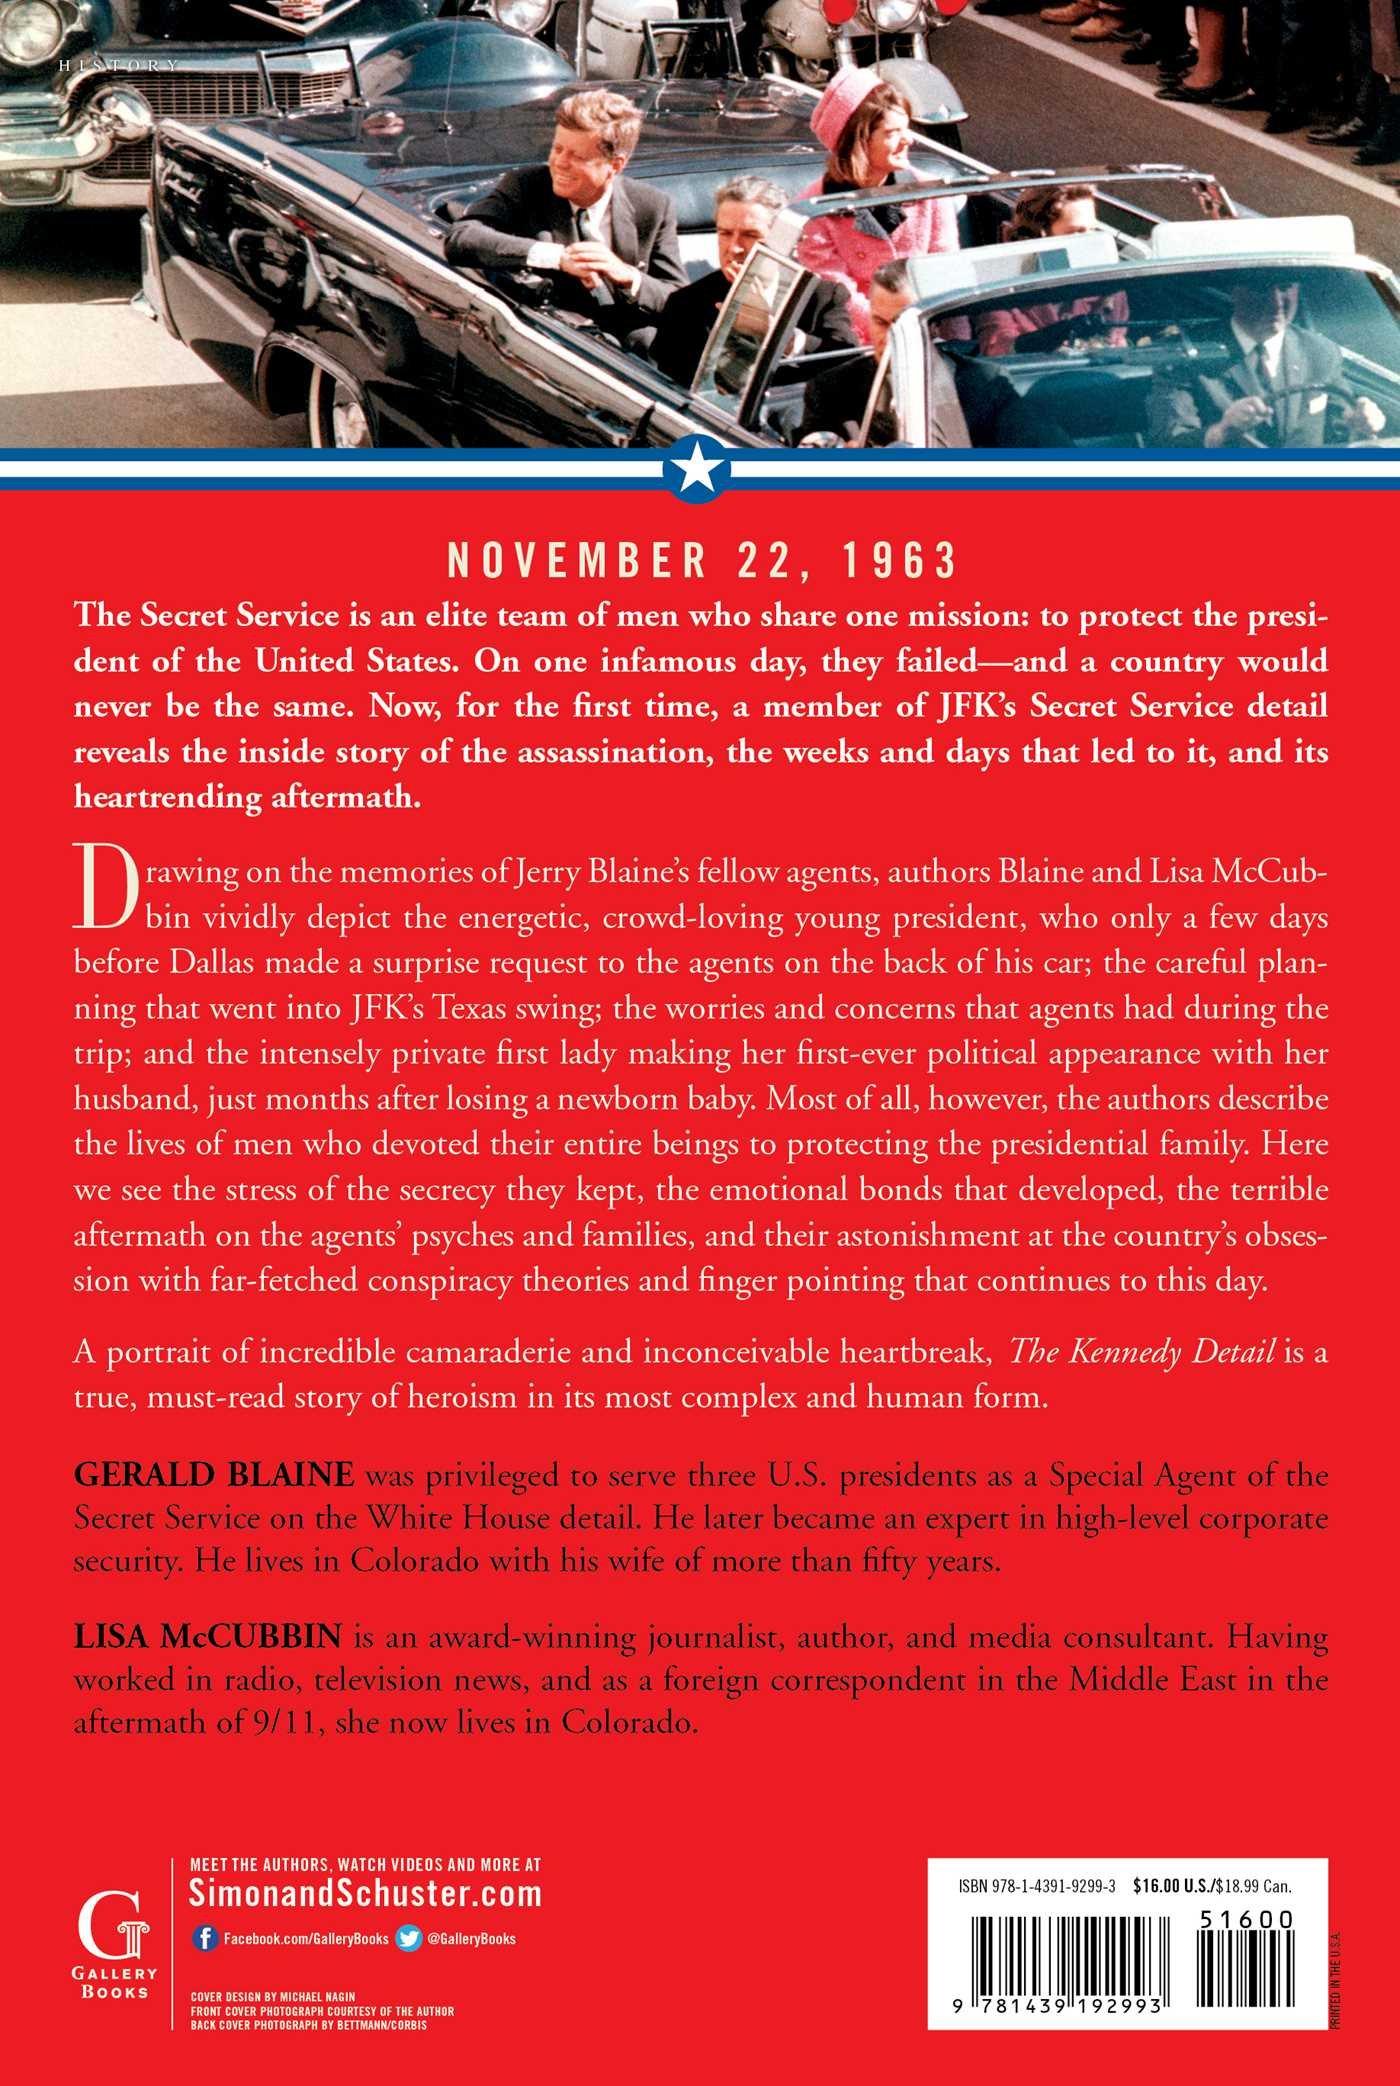 Amazon: The Kennedy Detail: Jfk's Secret Service Agents Break Their  Silence (9781439192993): Gerald Blaine, Lisa Mccubbin, Clint Hill: Books